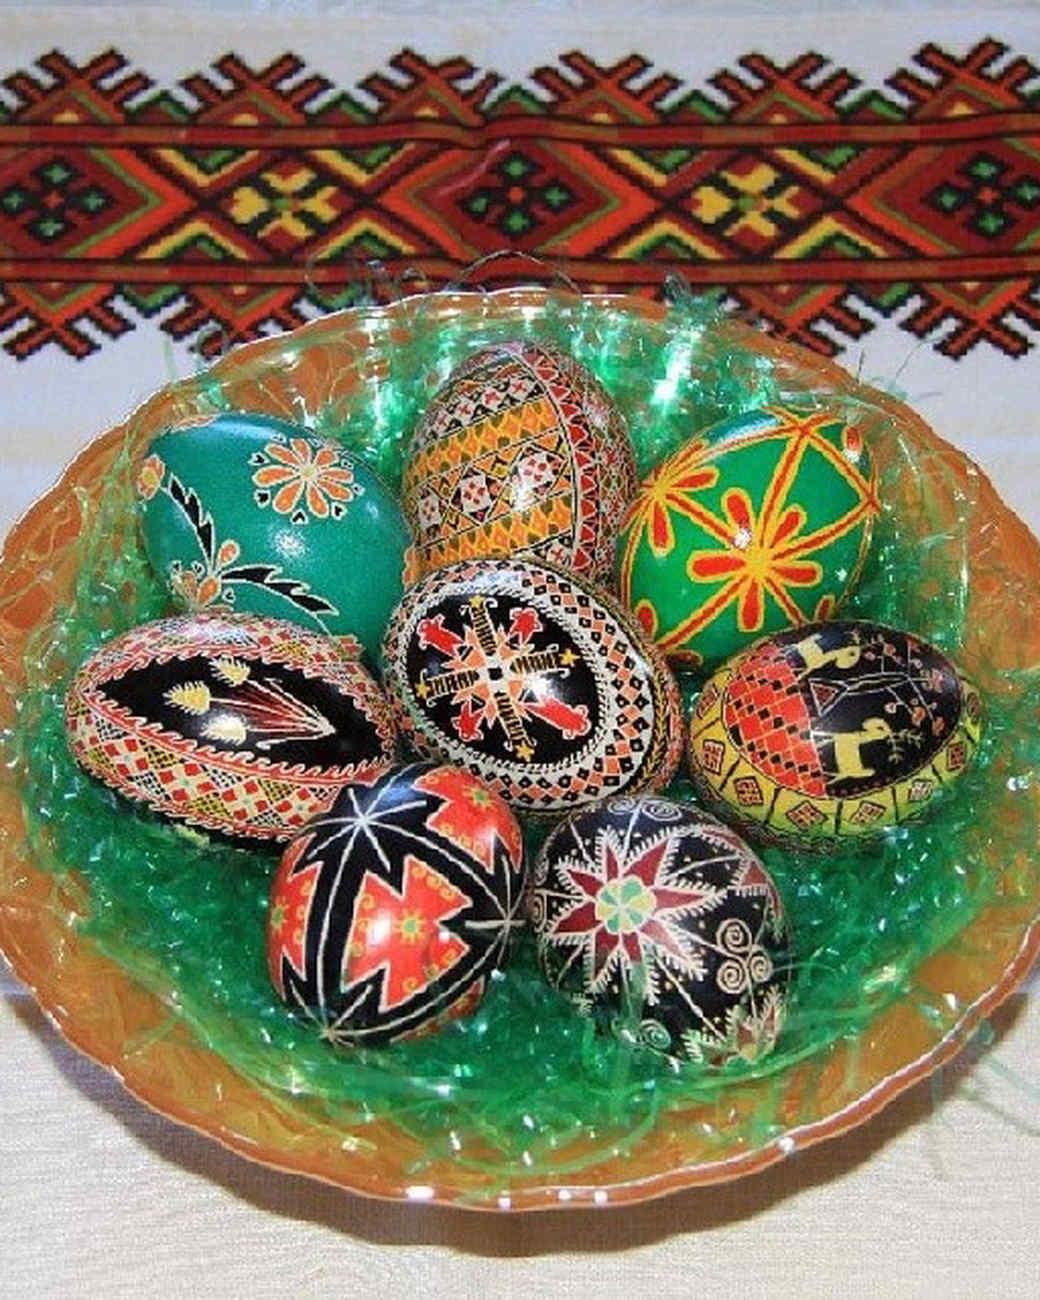 marthas-egg-hunt-bonniepotoroka-0414.jpg